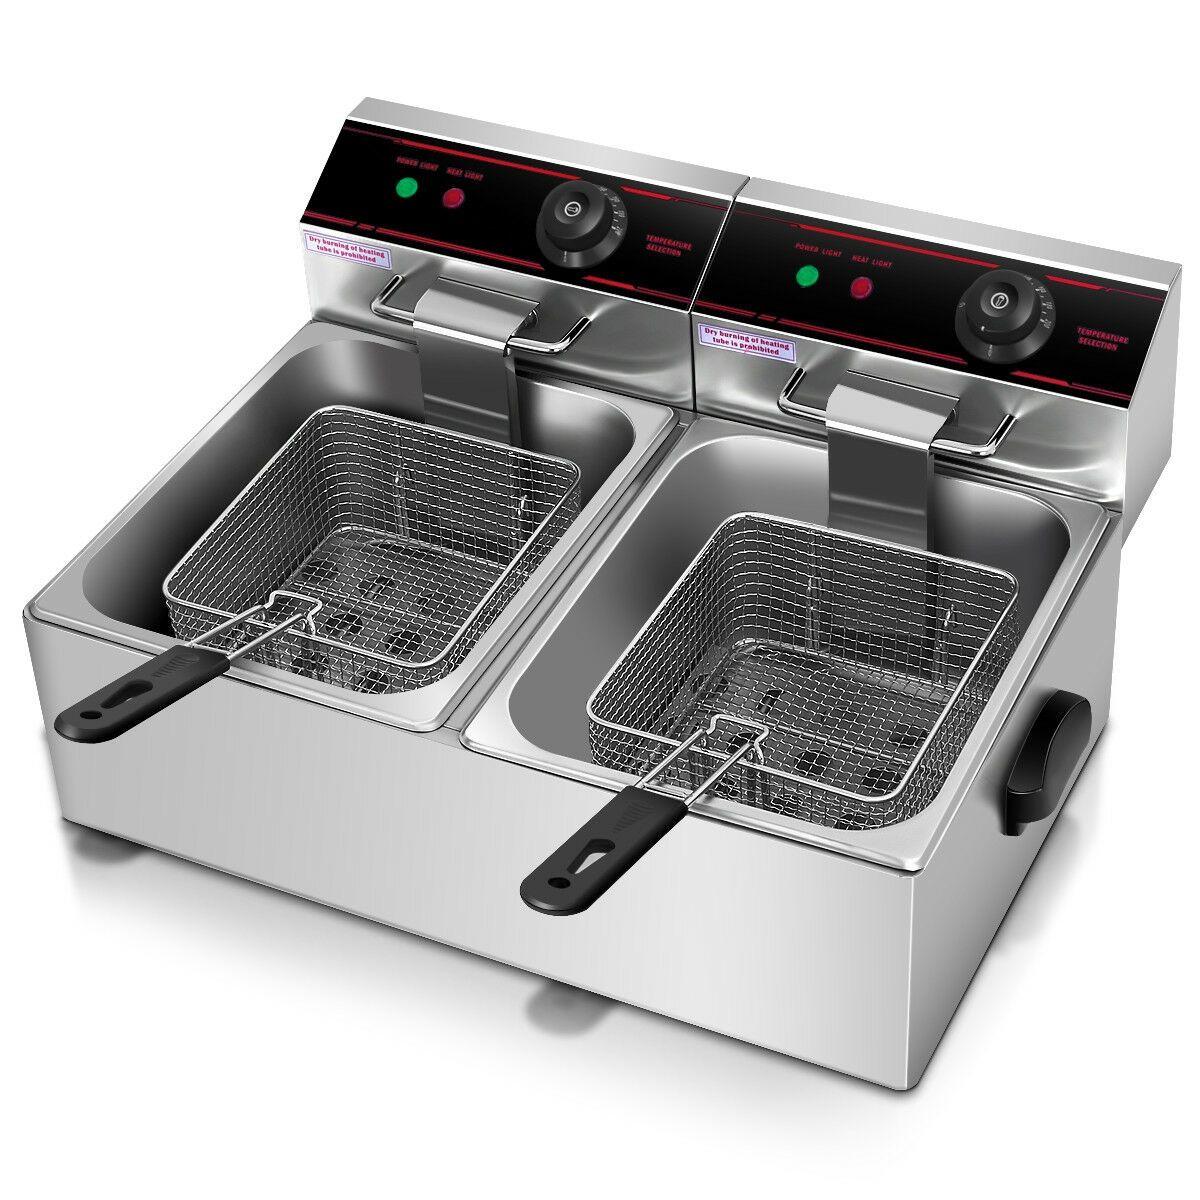 19 QT Multifunctional Air Fryer Oven 1800W Dehydrator